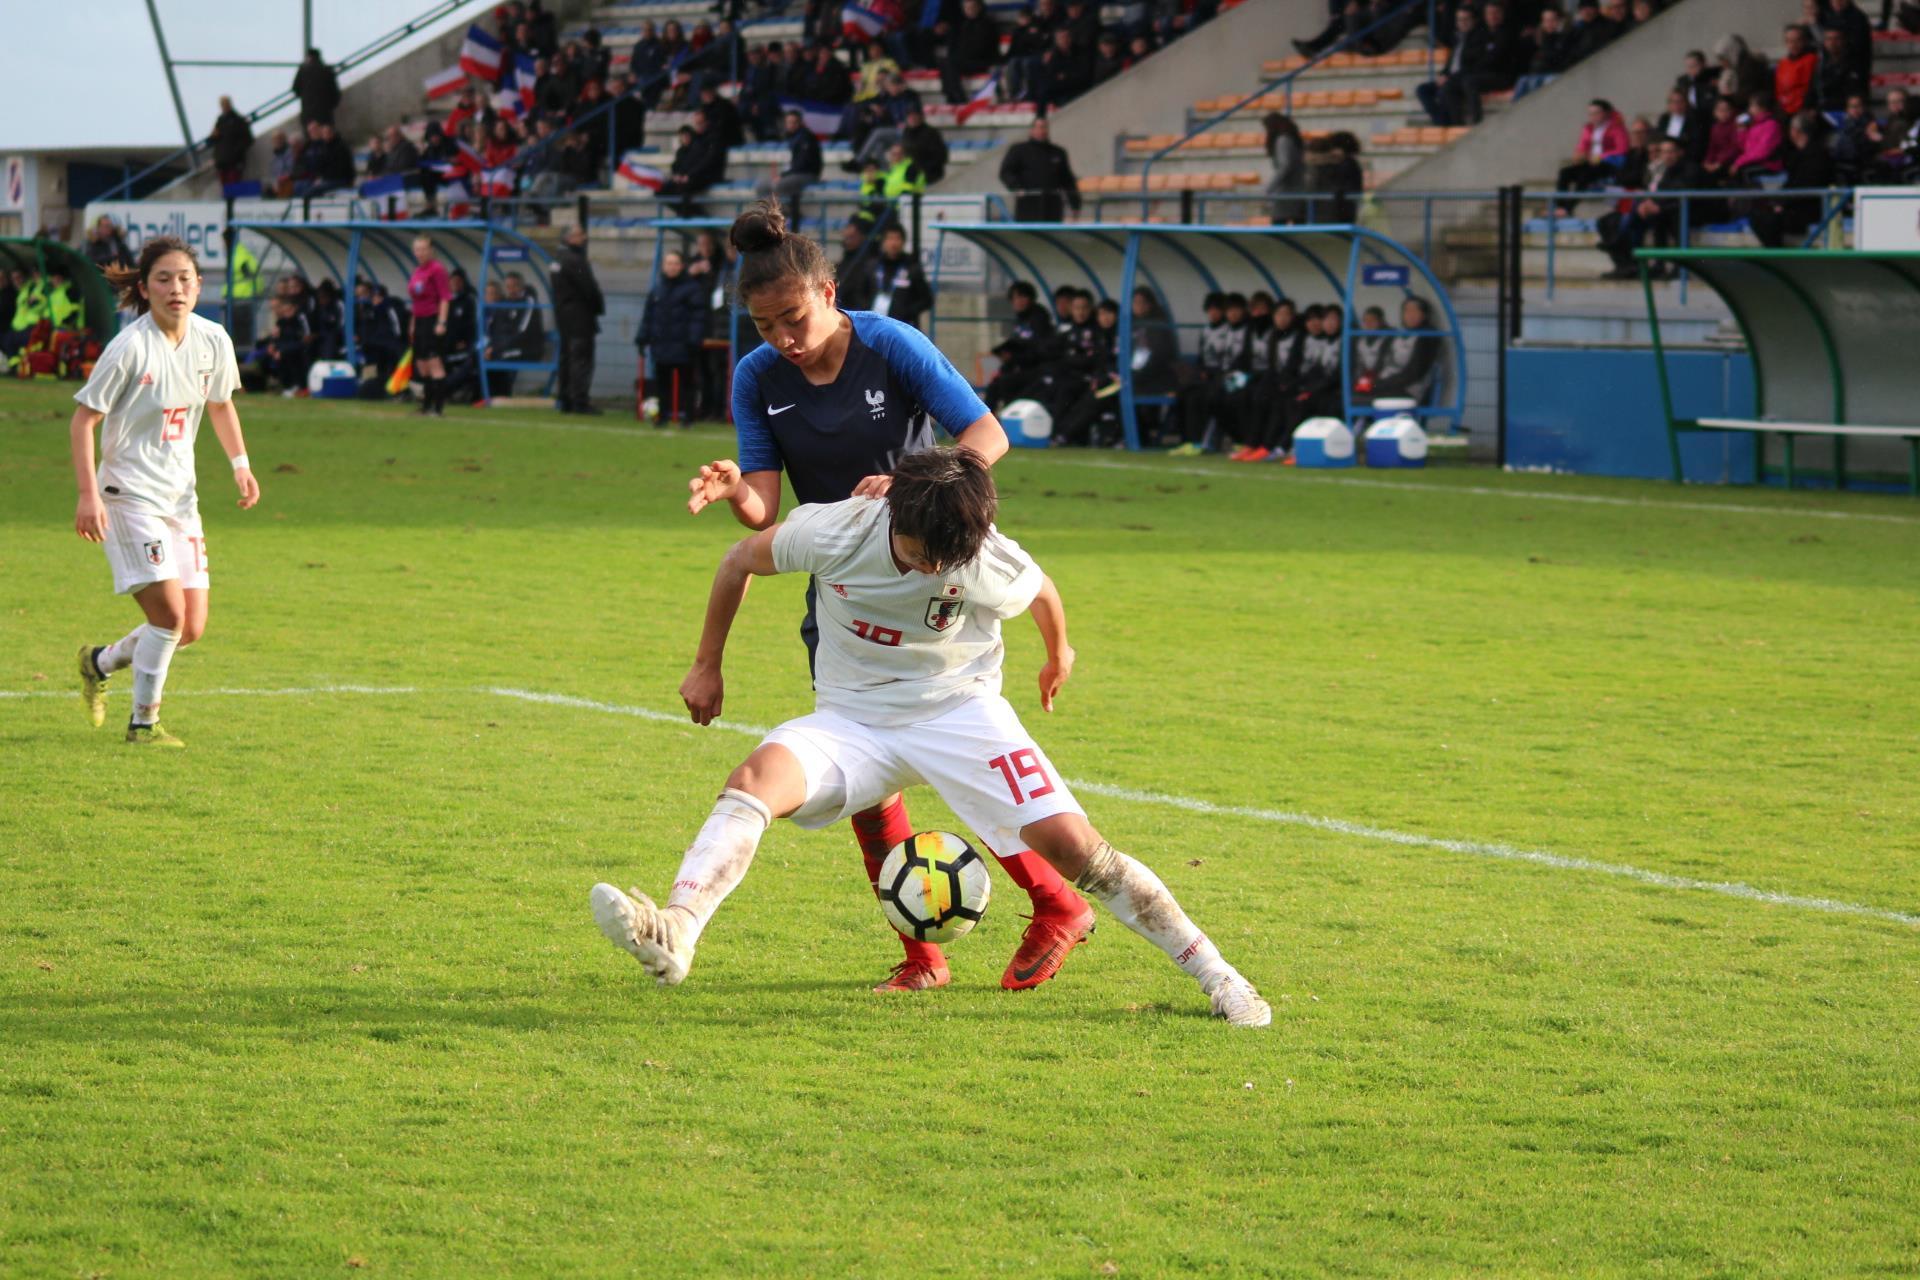 Bacha tente de passer devant Ushijima (photo Ligue de Bretagne)